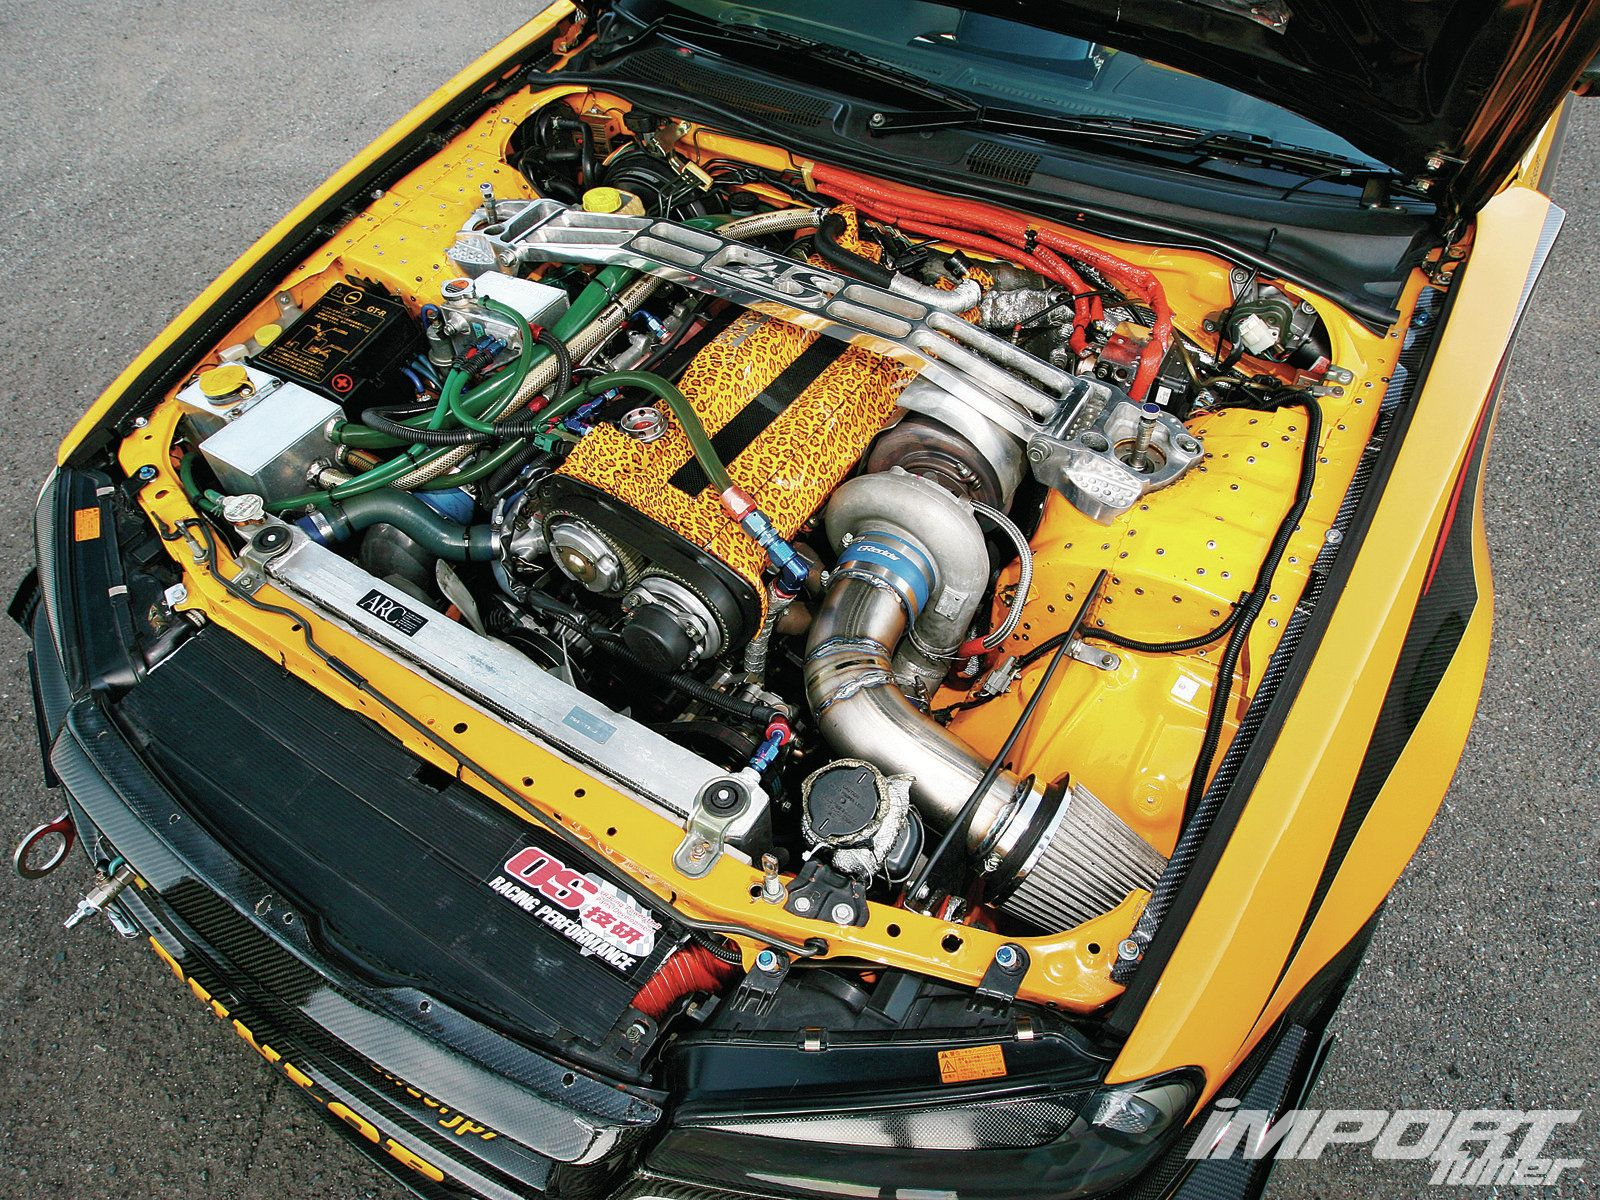 Nissan BNR34 Skyline Engine Bay Skyline Import FastFurious